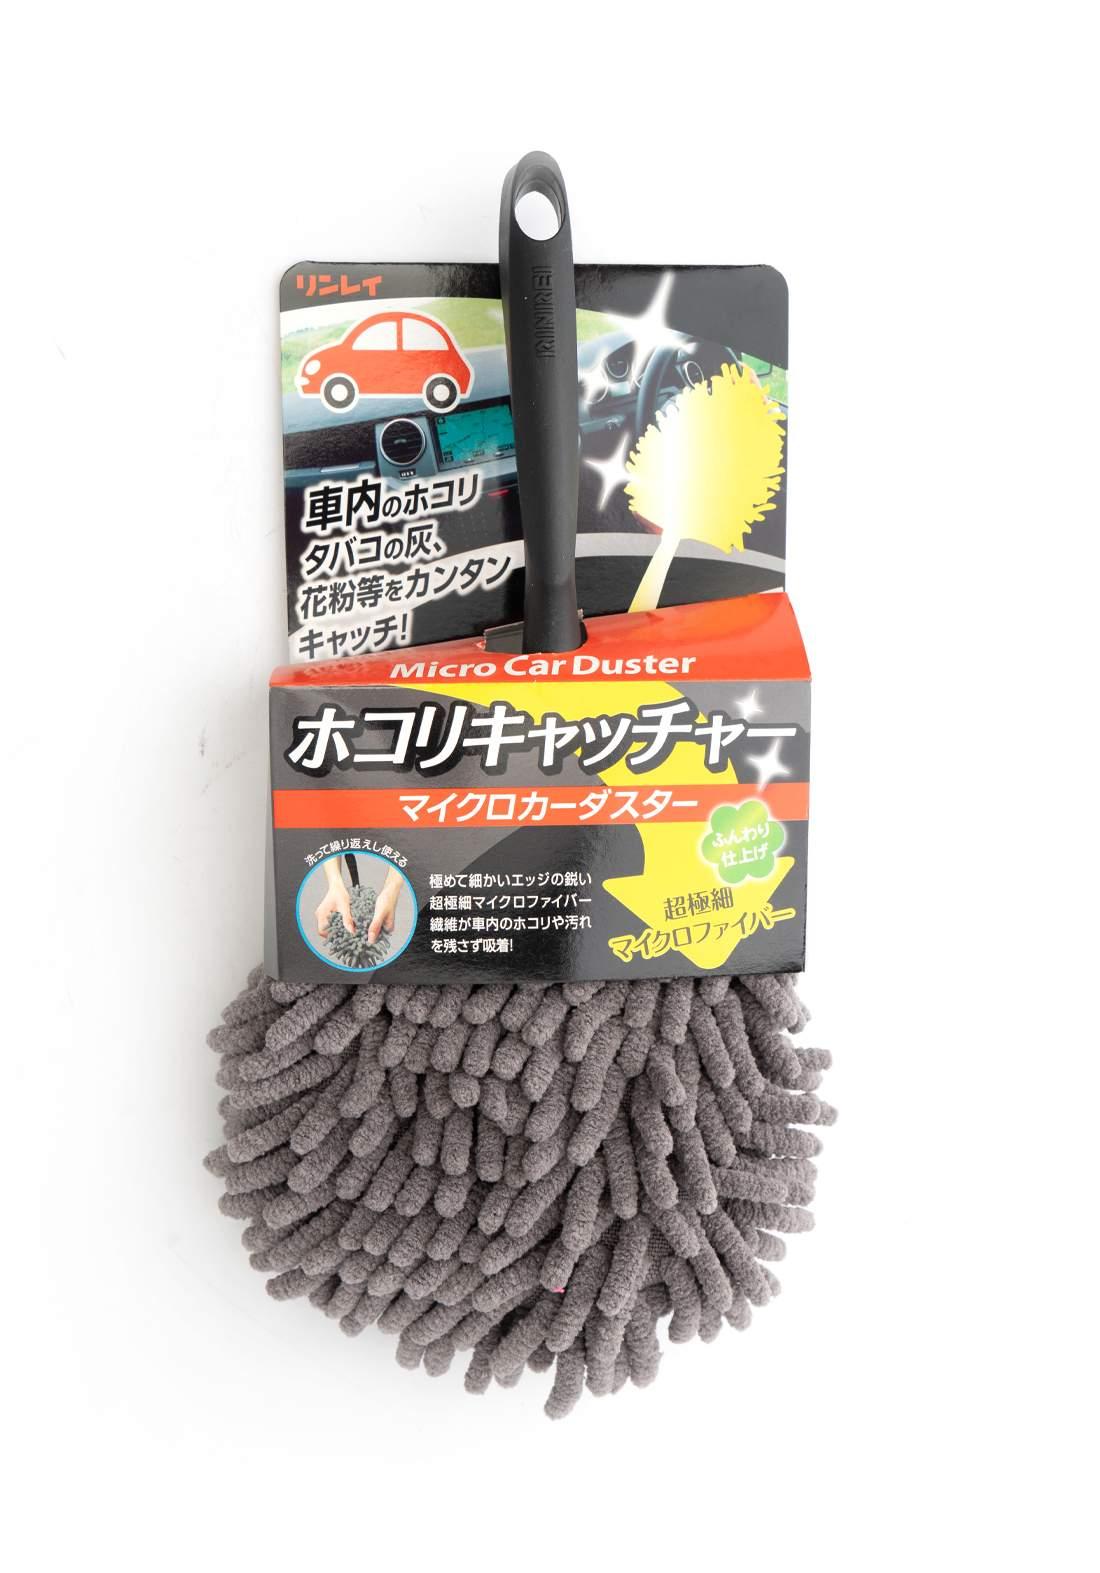 Rinrei 965284 Dust Catcher Gray 107 g قطعة قماش لغسيل السيارات